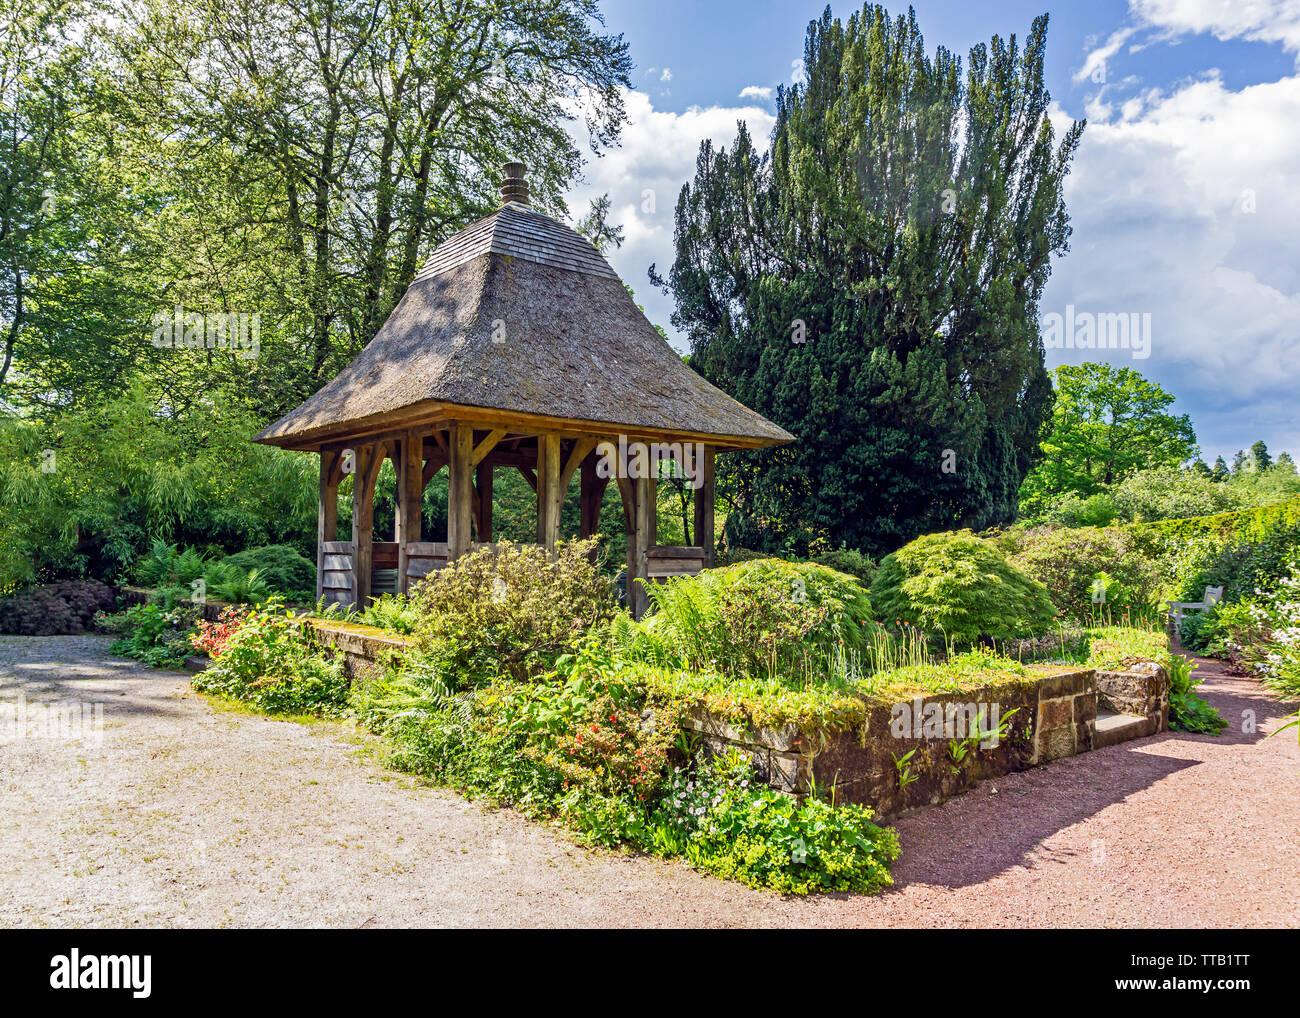 Garden Centre: Ayrshire East Stock Photos & Ayrshire East Stock Images